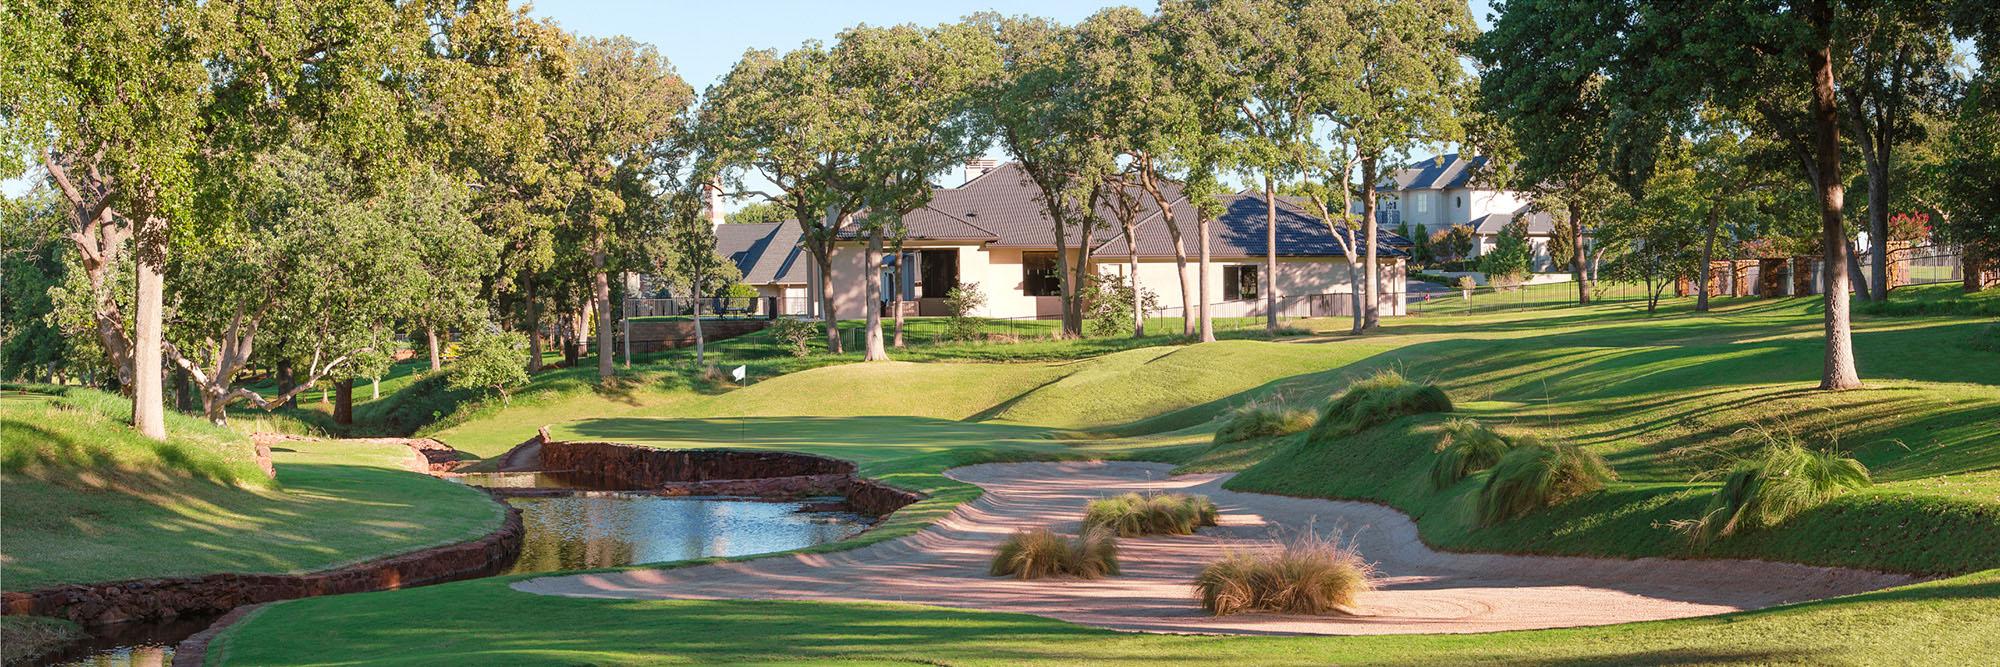 Golf Course Image - Oak Tree National No. 13